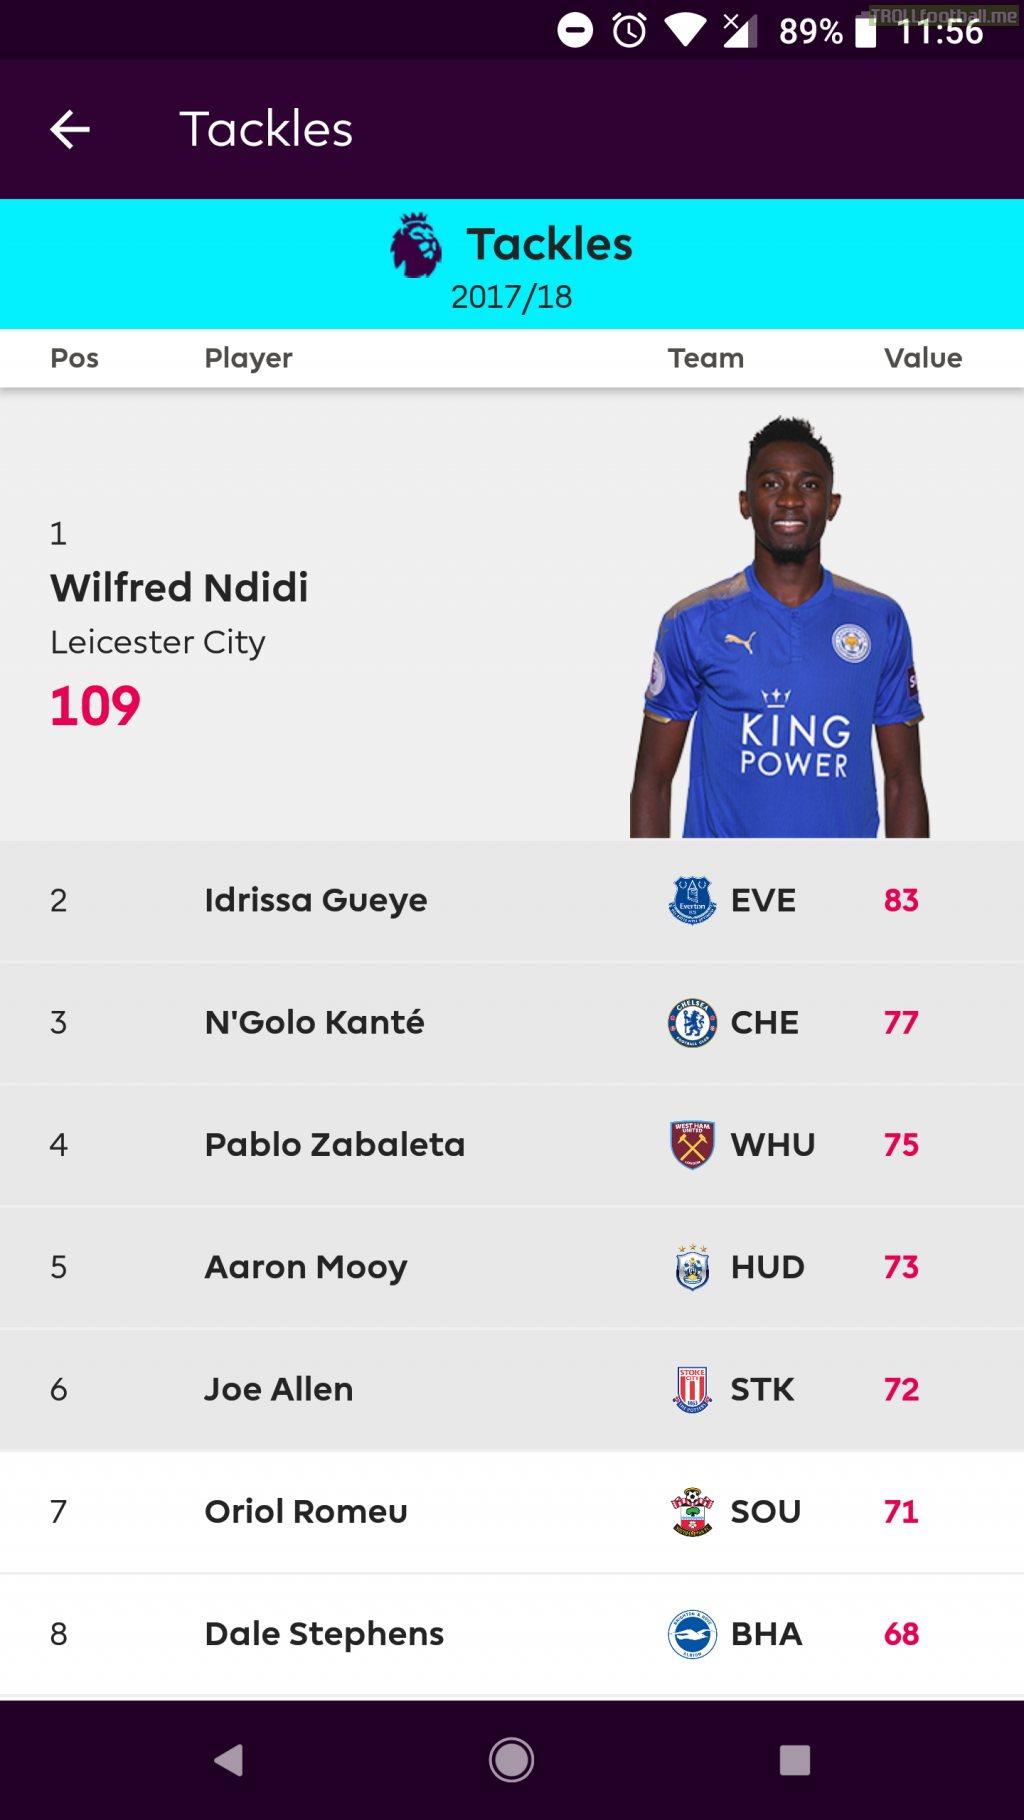 Tackles this season in the Premier League. Ndidi-109, Gueye-83, Kante-77, Zabaleta-75, Mooy-73.